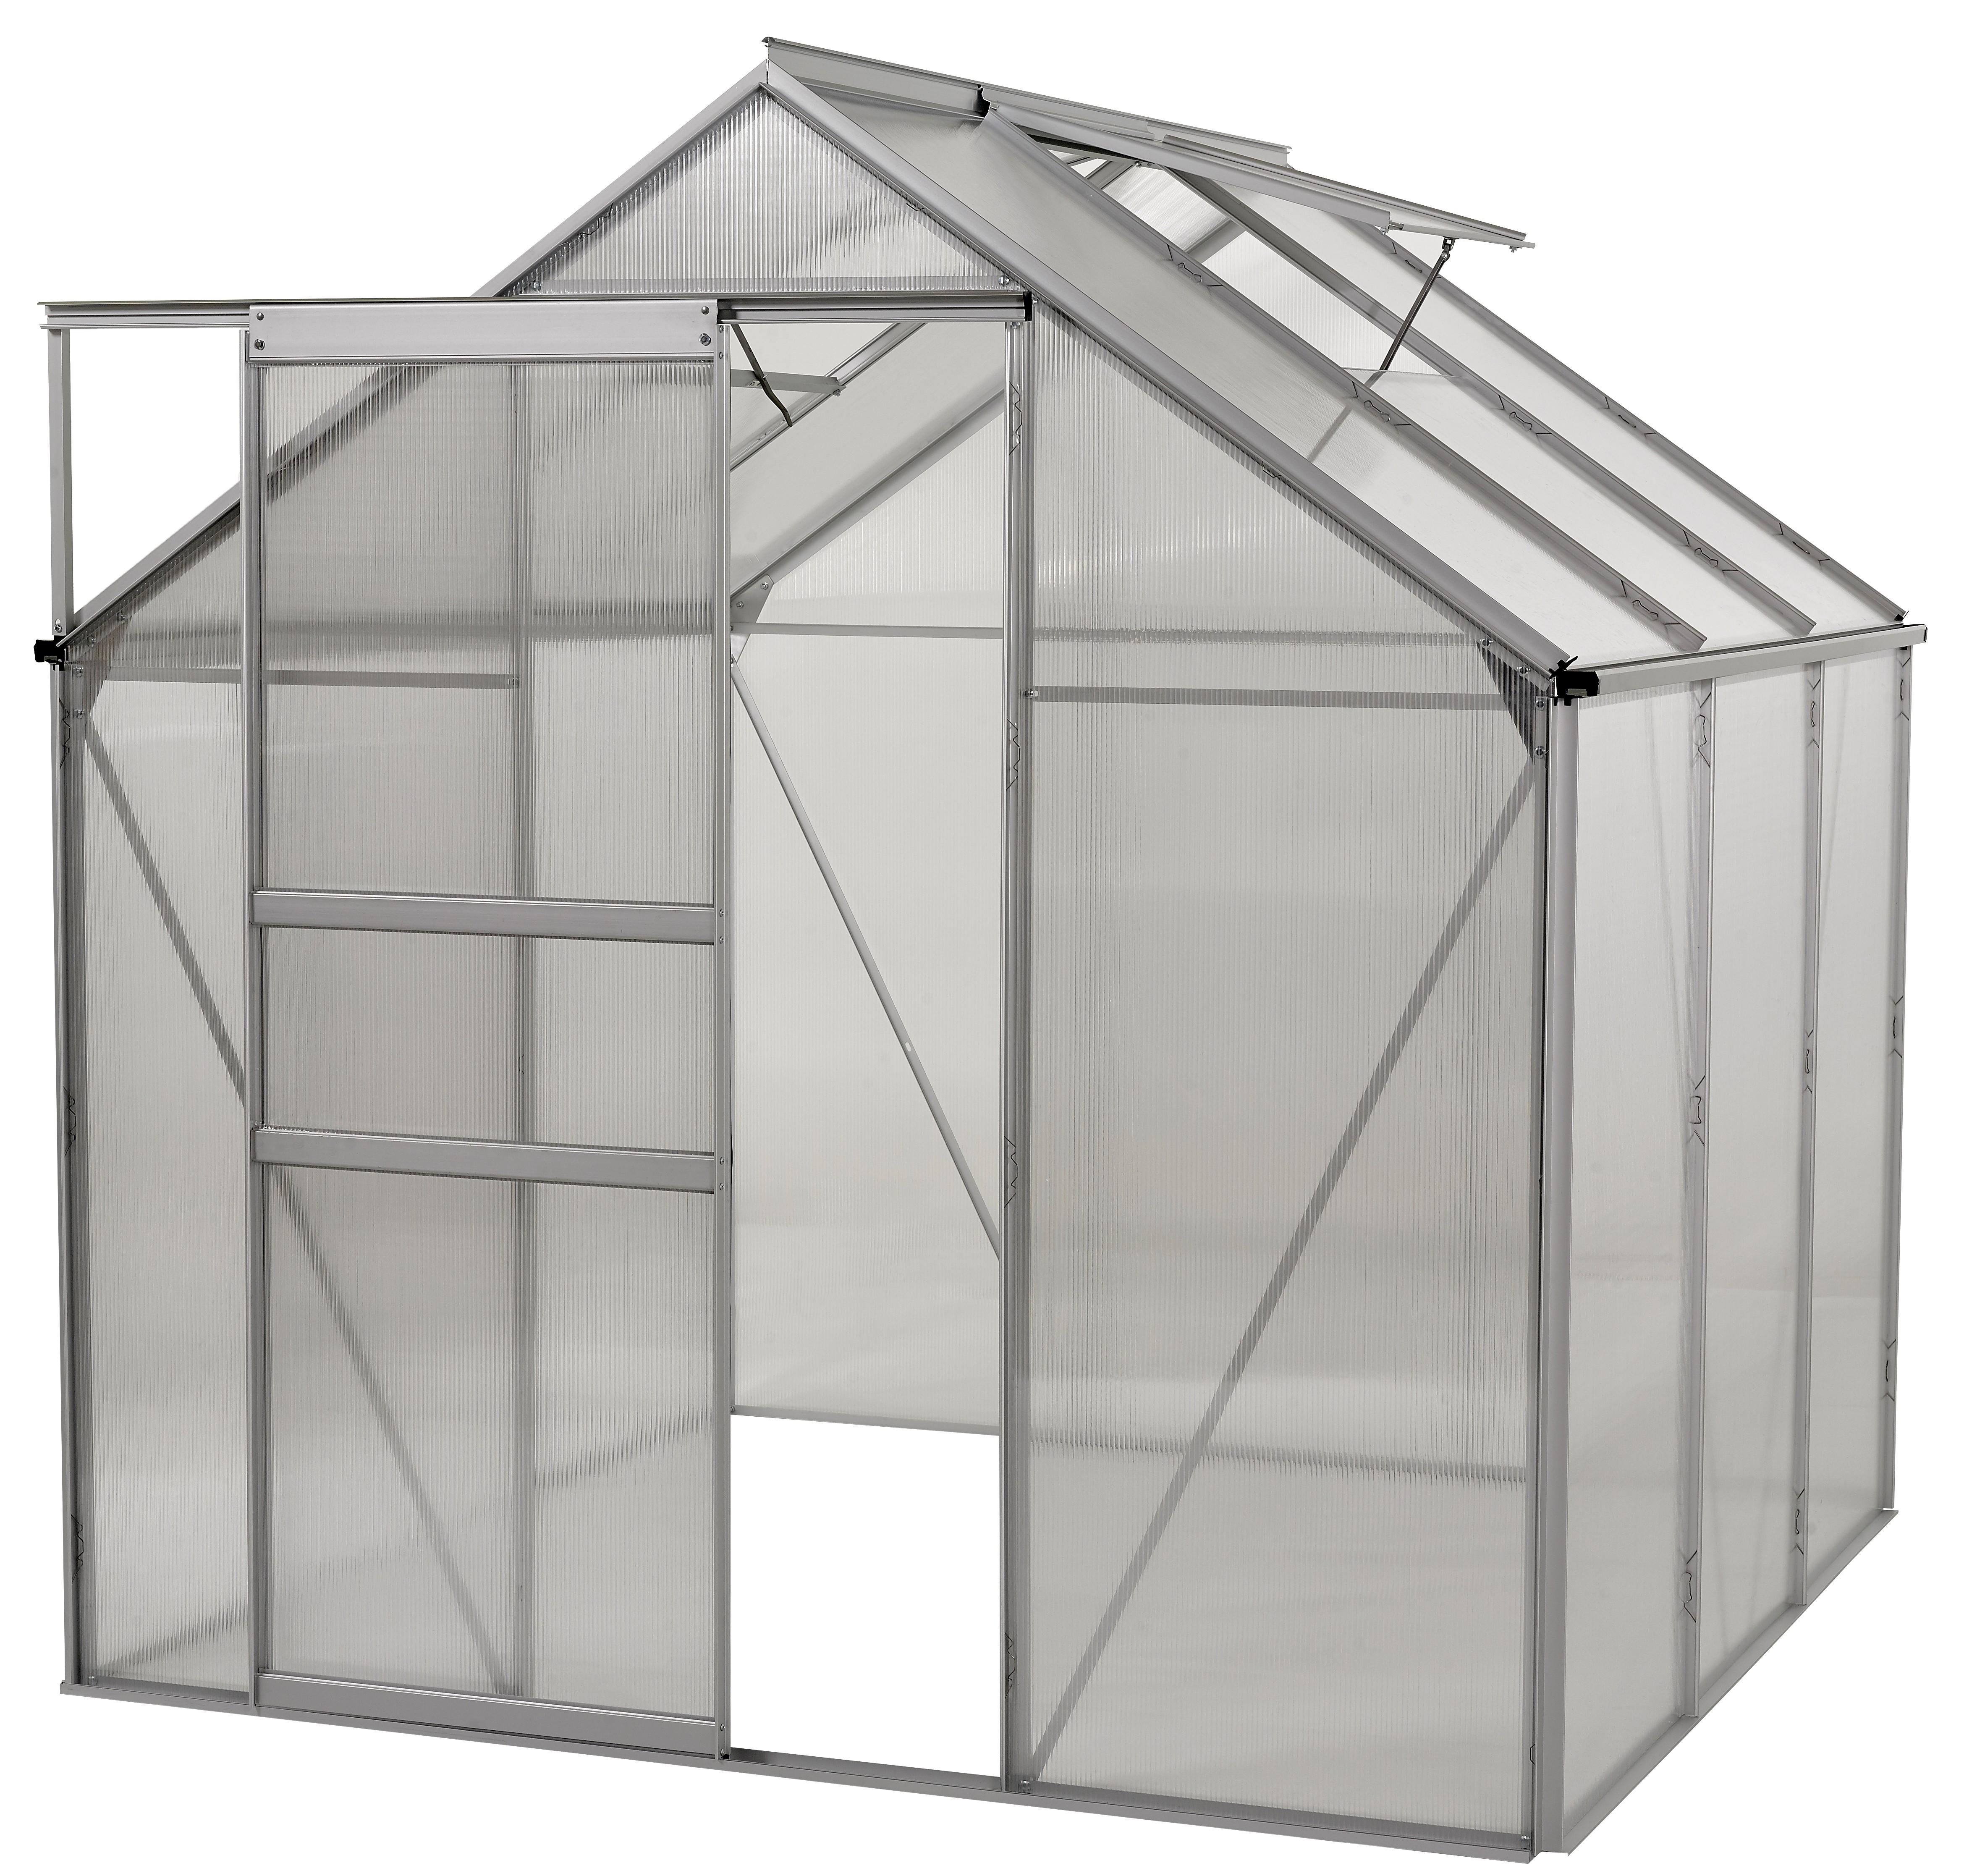 Ogrow 6x6 Ft. Walk In Greenhouse - Large Heavy Duty Aluminium Lawn & Garden Grow House - 36 Sq. Ft / 3.34 Mq - Clear